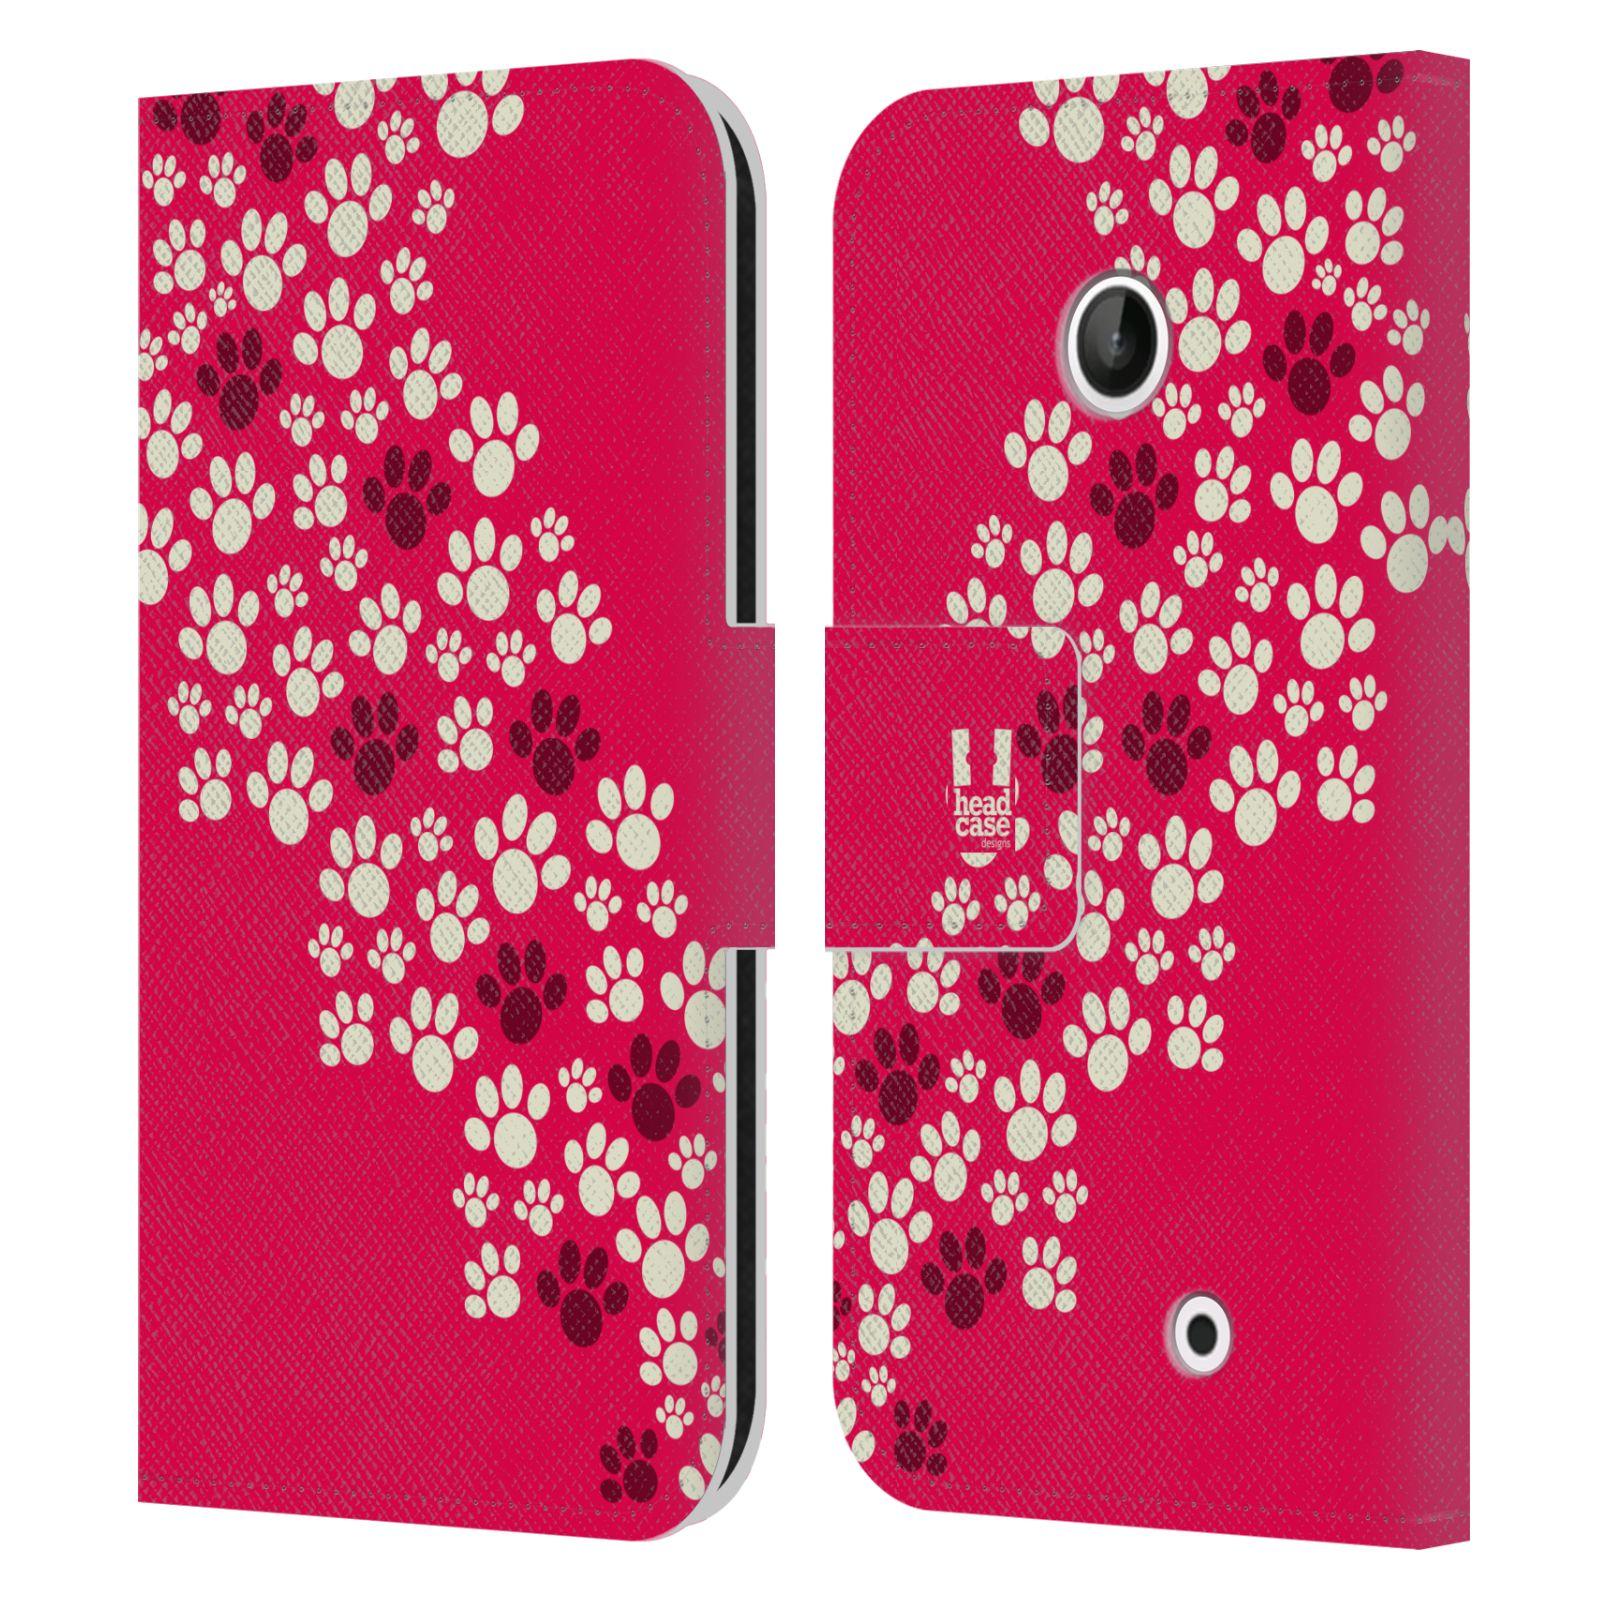 HEAD CASE Flipové pouzdro pro mobil NOKIA LUMIA 630 / LUMIA 630 DUAL Pejsek ťapky růžová barva